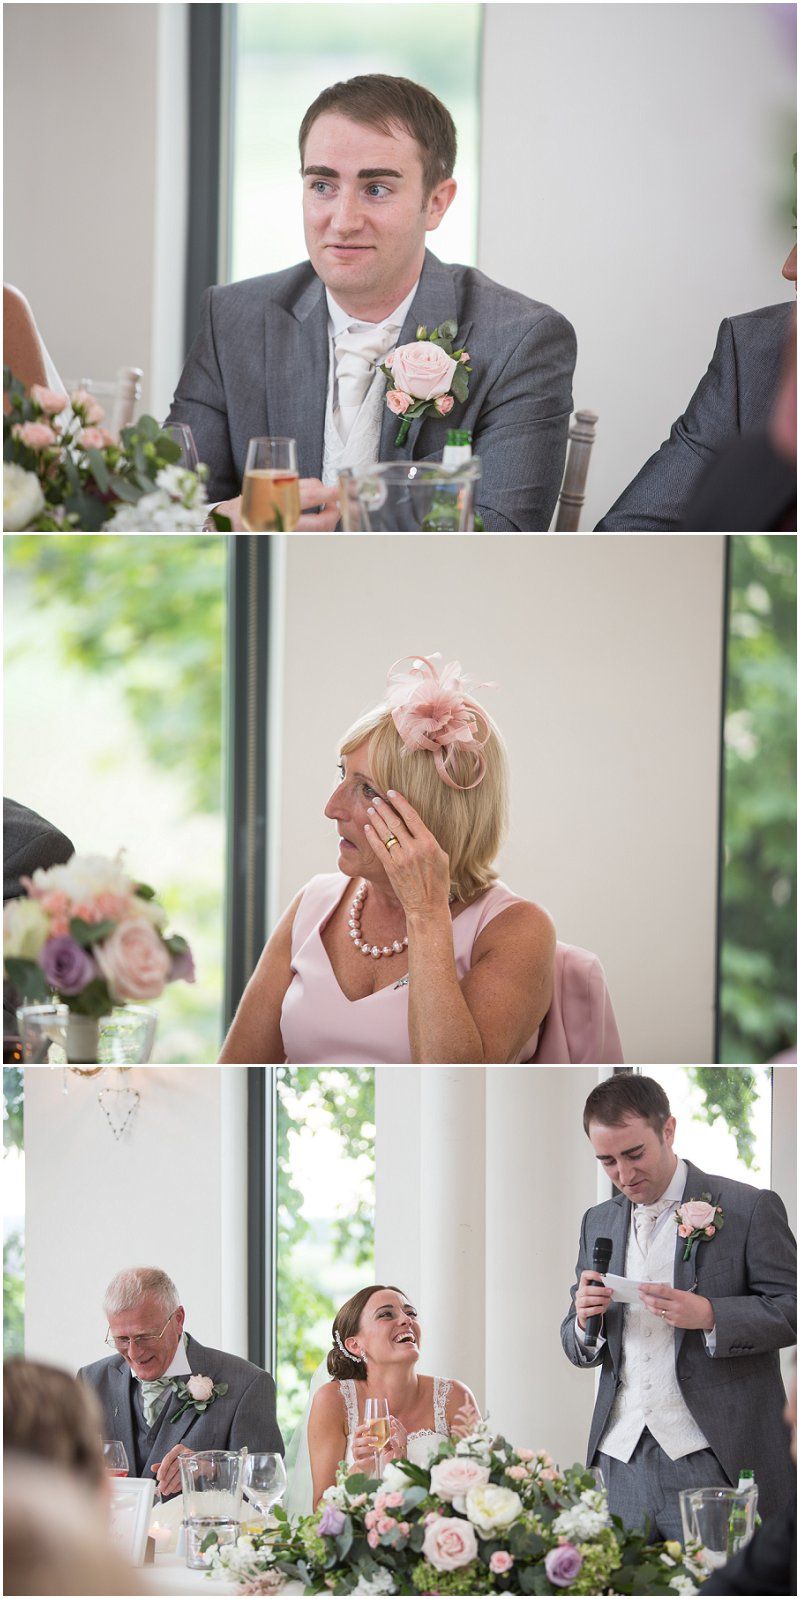 Speeches and groom's speech